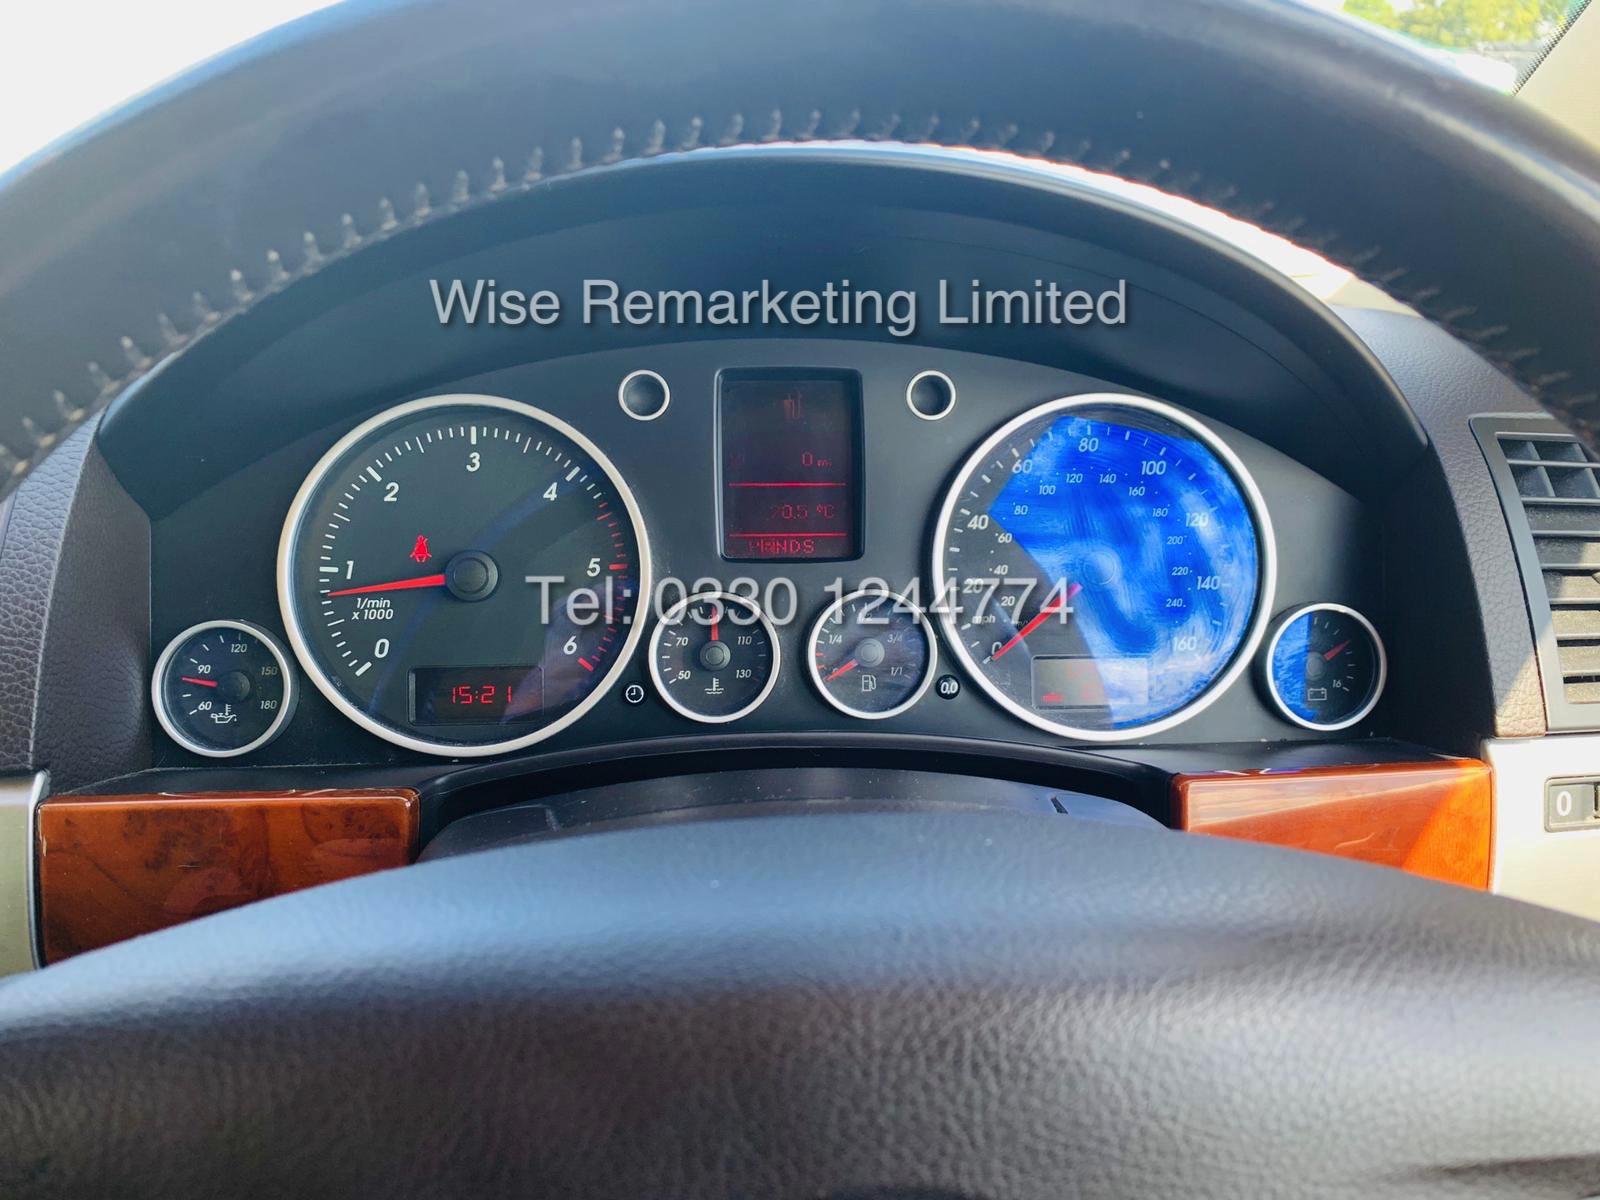 VOLKSWAGEN TOUAREG 2.5 TDI SPORT AUTO 2004 REG 4x4 BLACK - CREAM LEATHER - Image 17 of 24